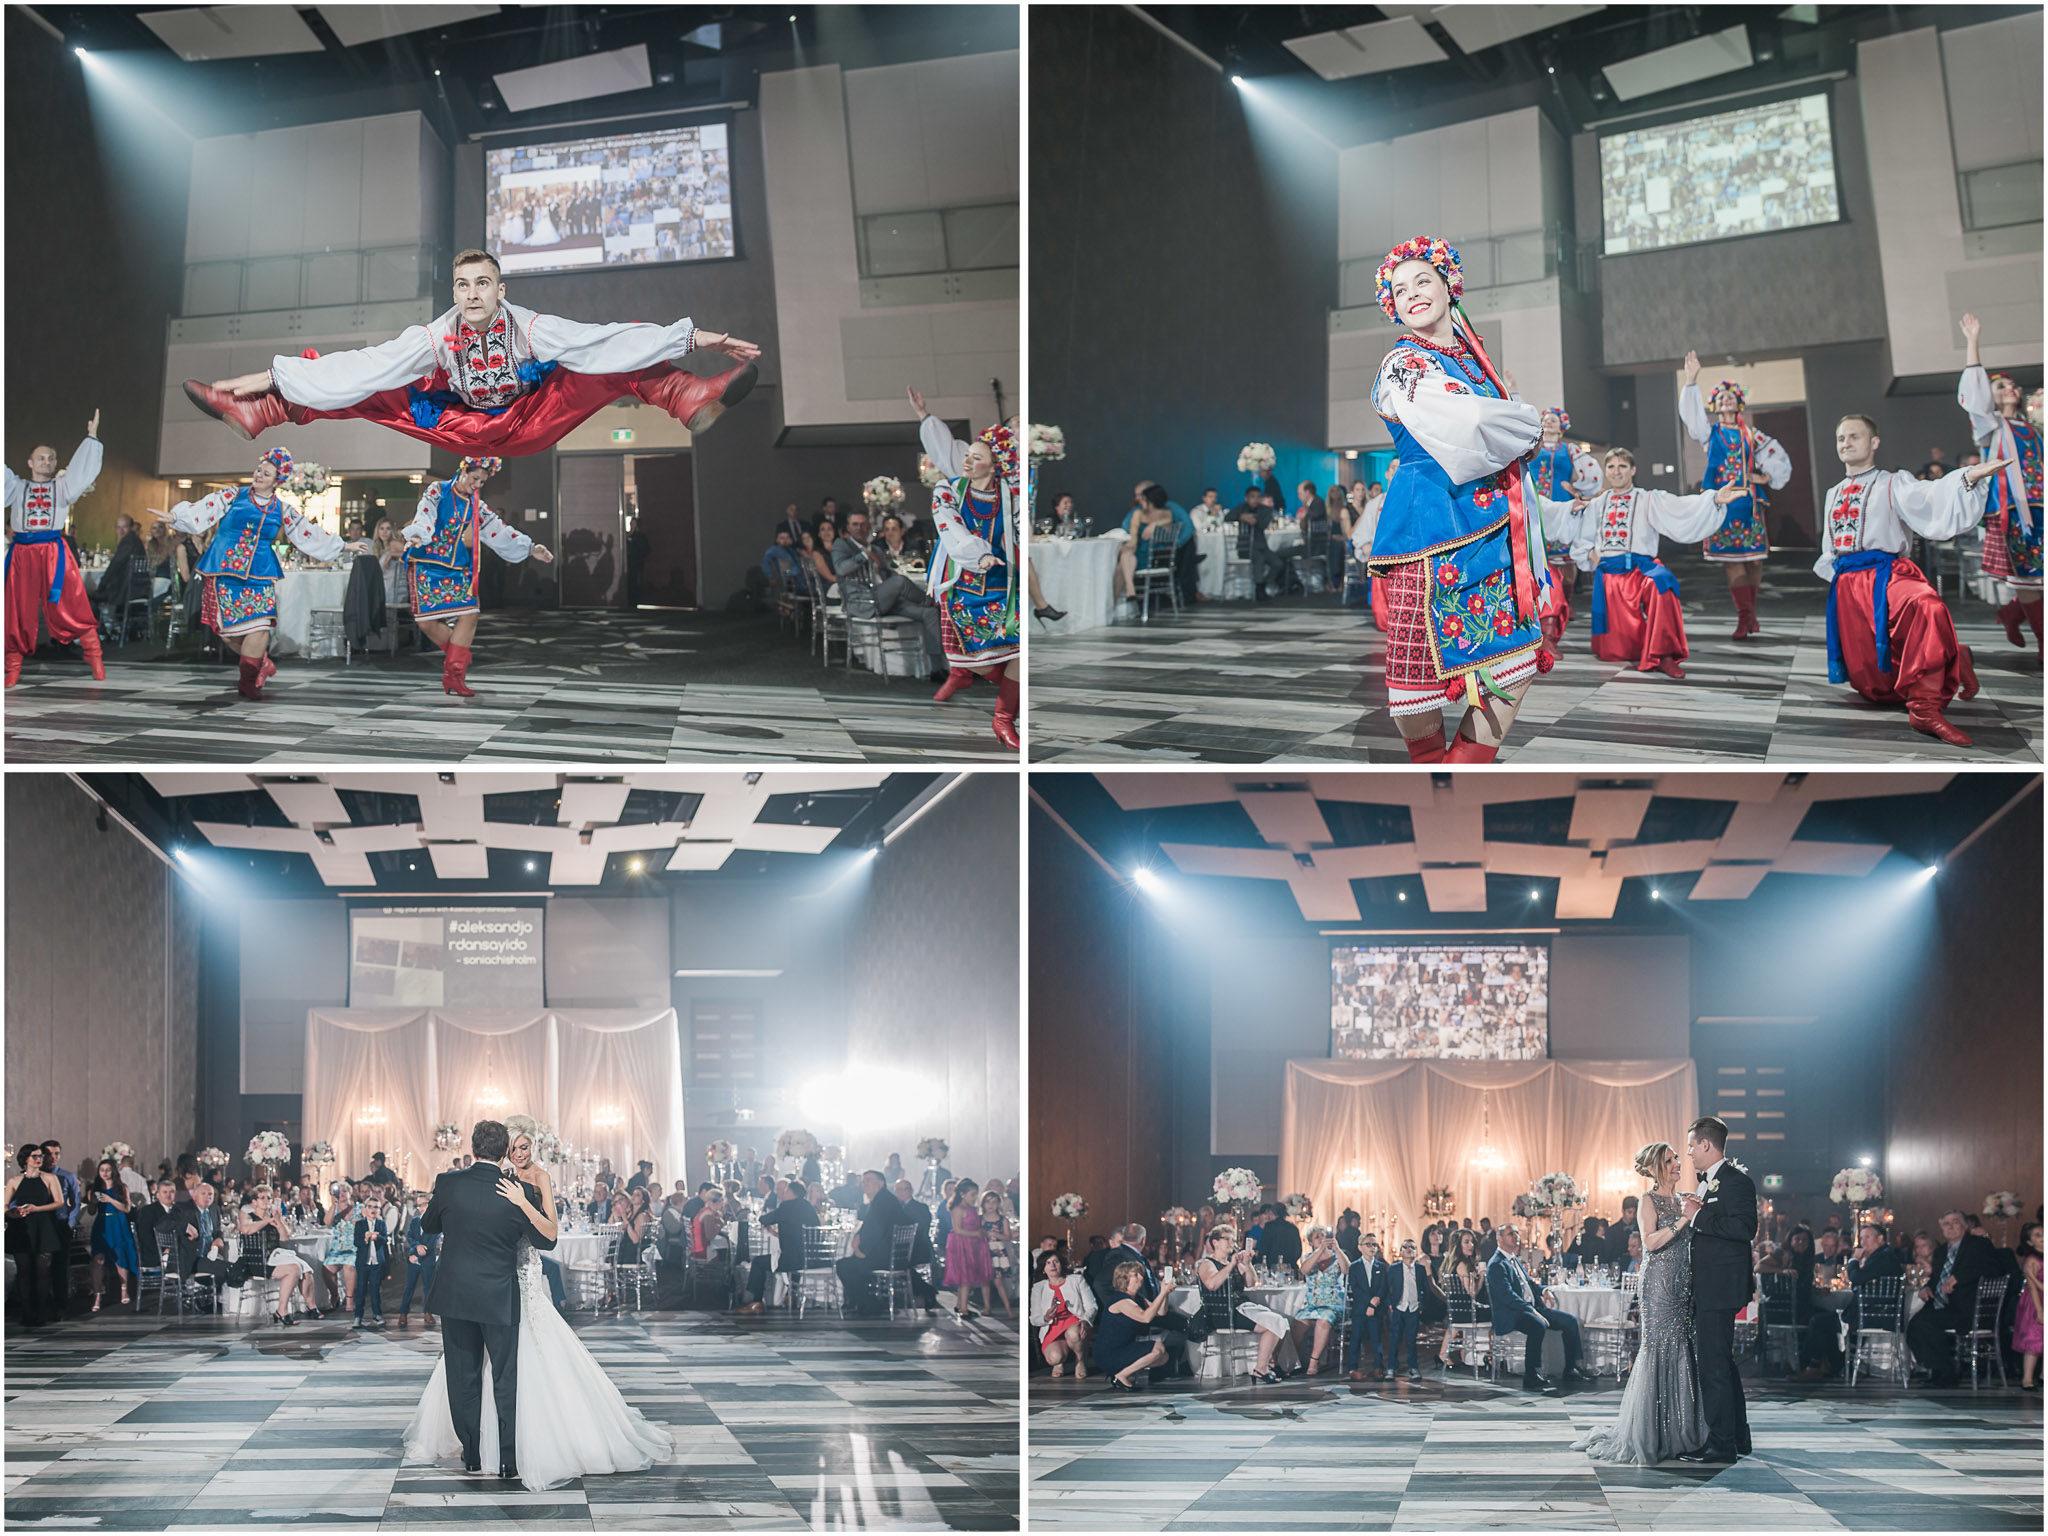 wedding-reception-universal-event-space-4